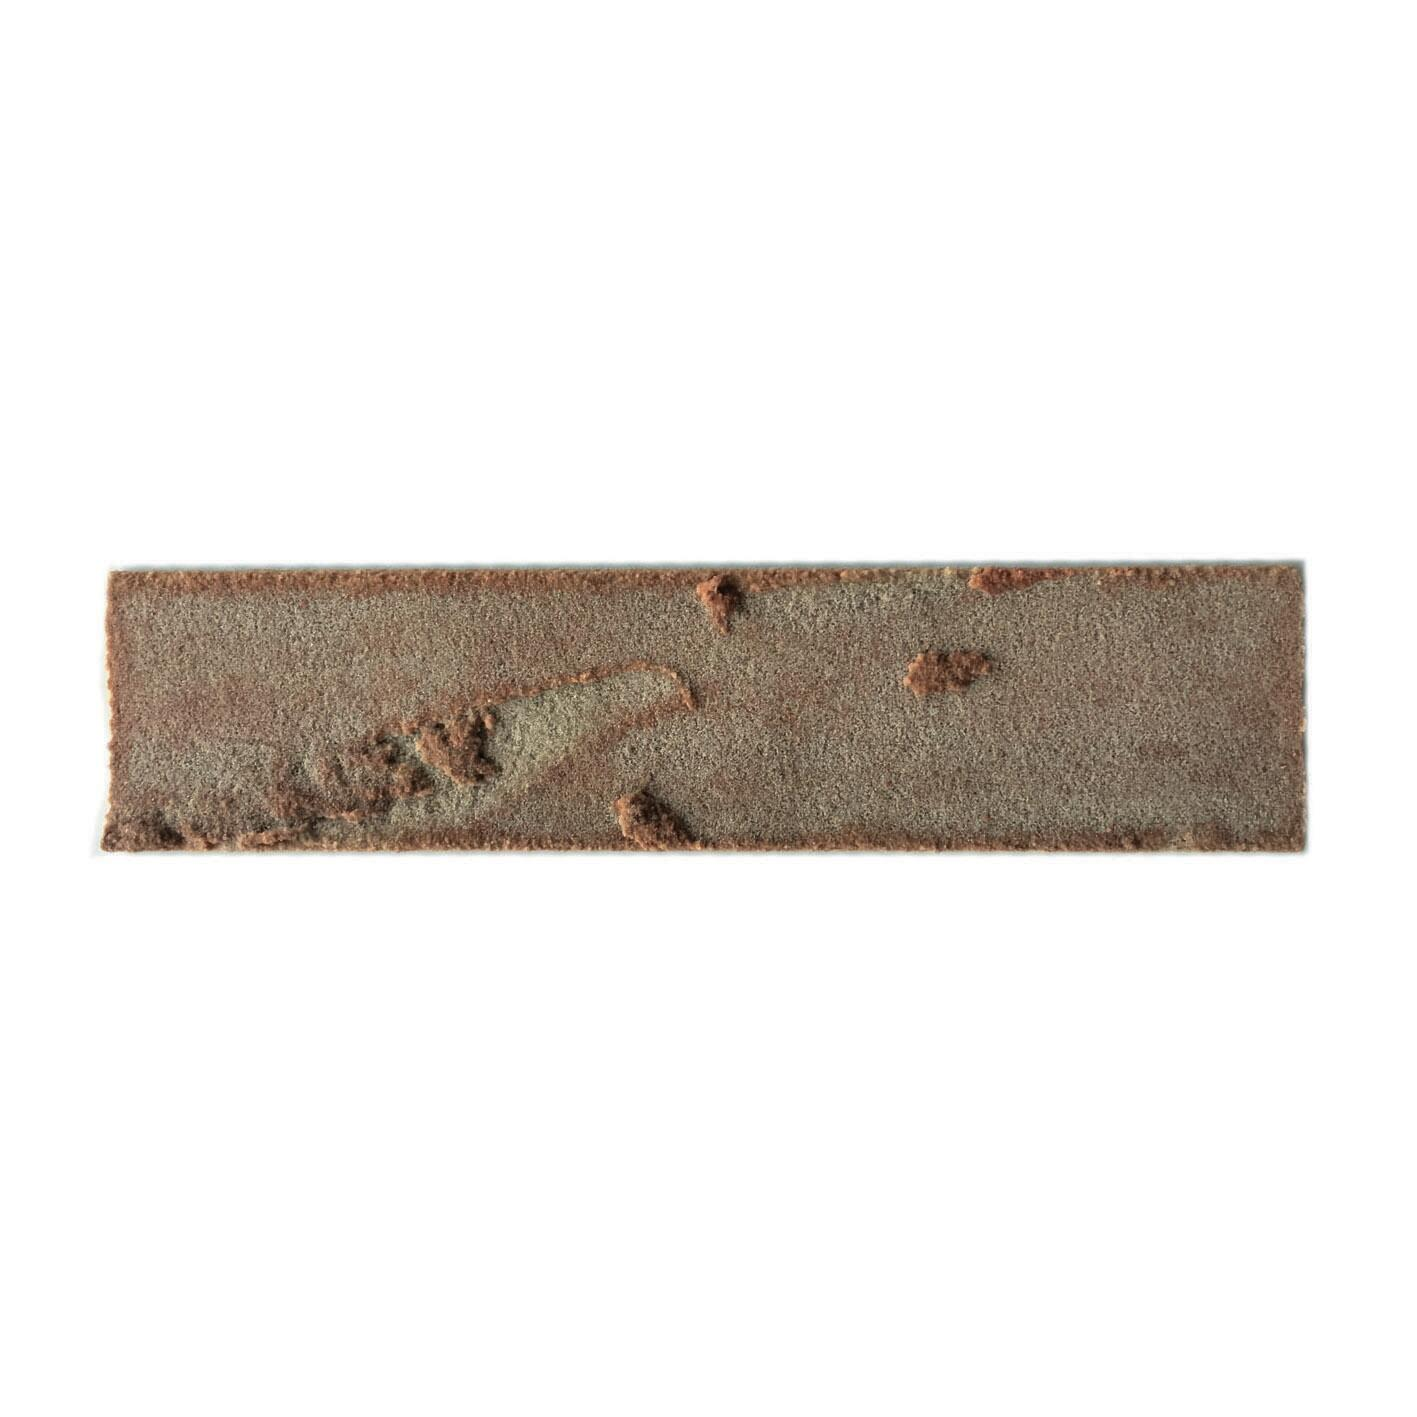 Rivestimento decorativo Elastolith Corsica rosso rustico - 3